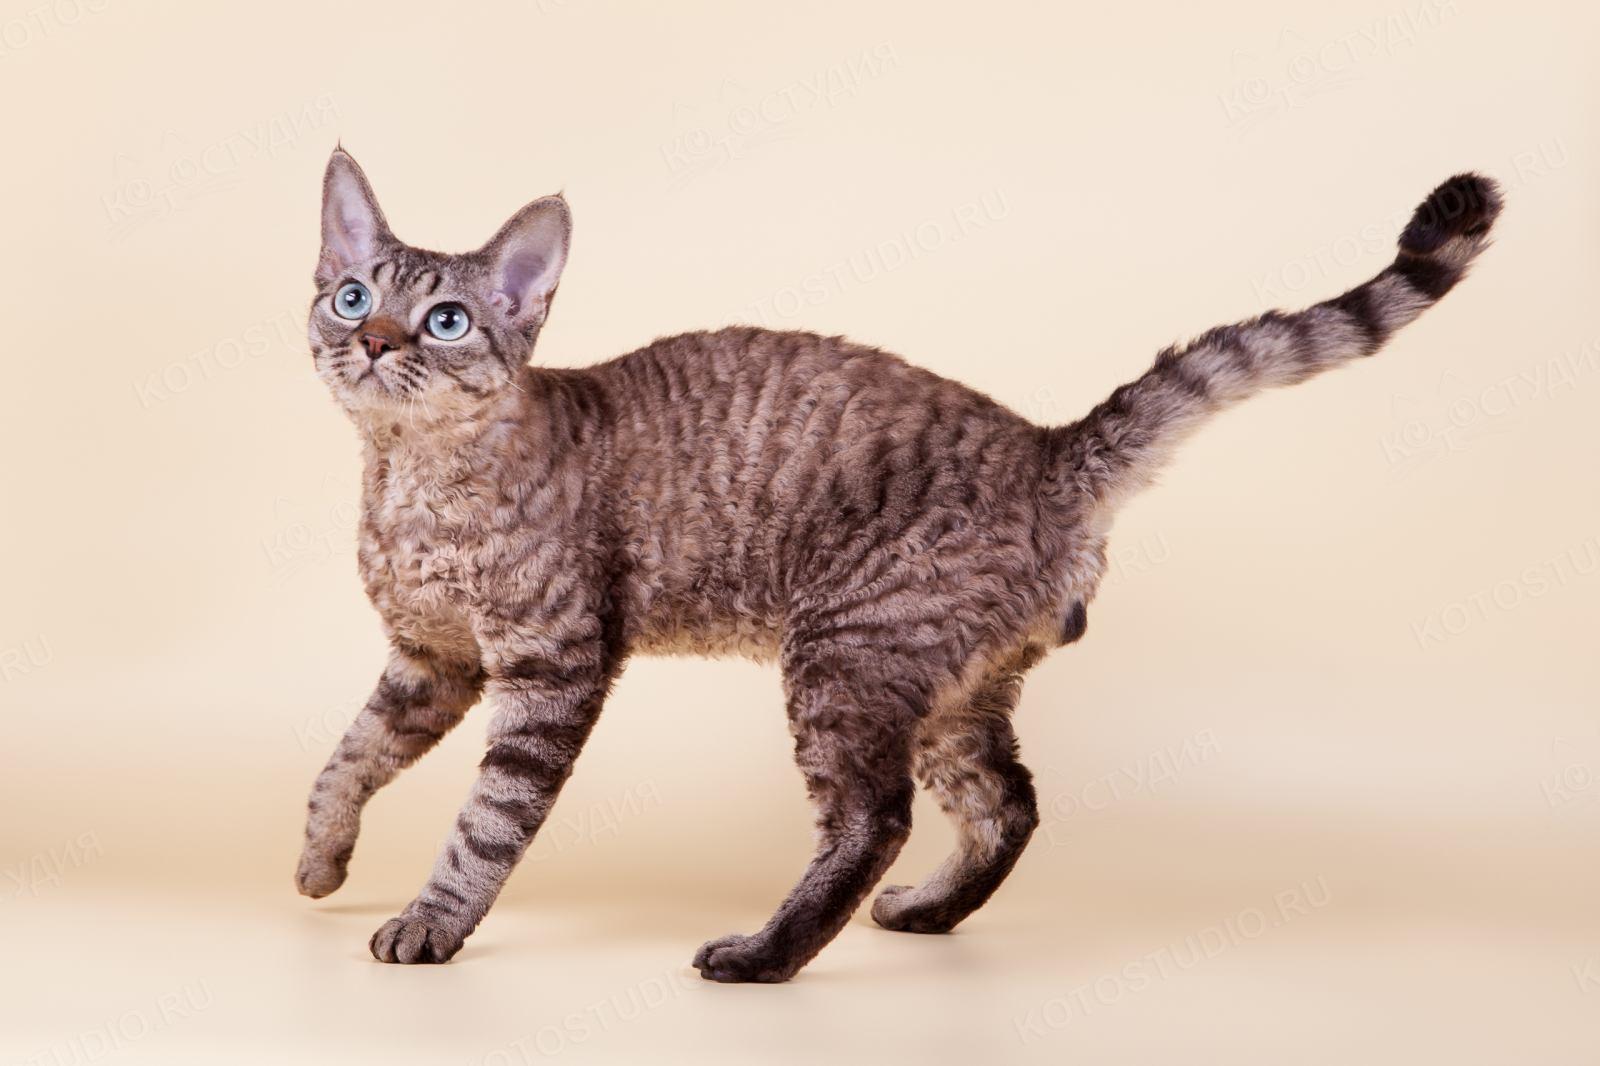 кошка девон рекс фото описание приспособления